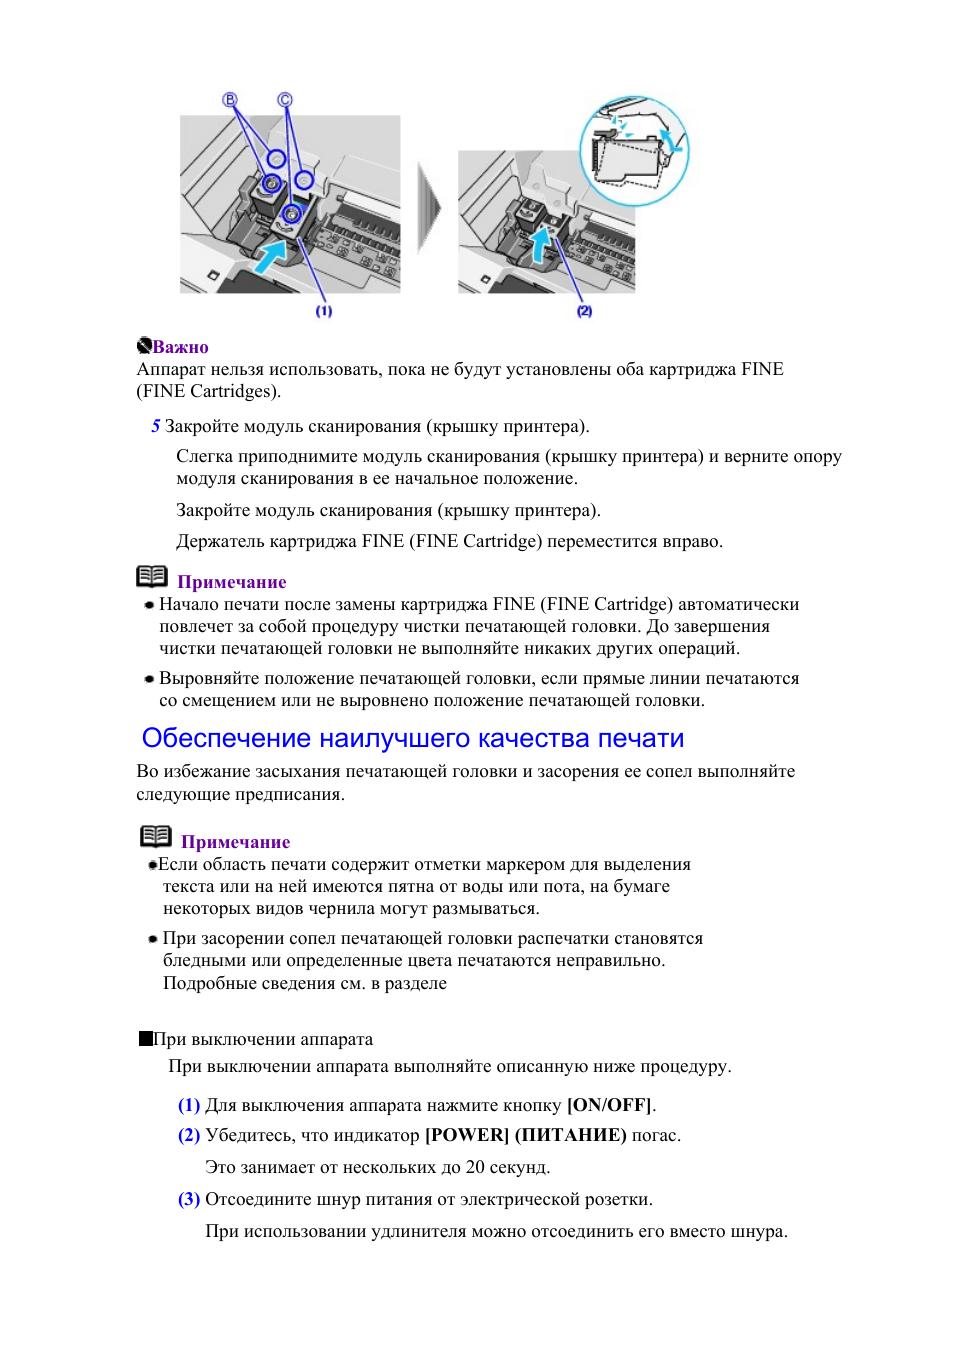 принтер canon pixma mp140 инструкция на русском